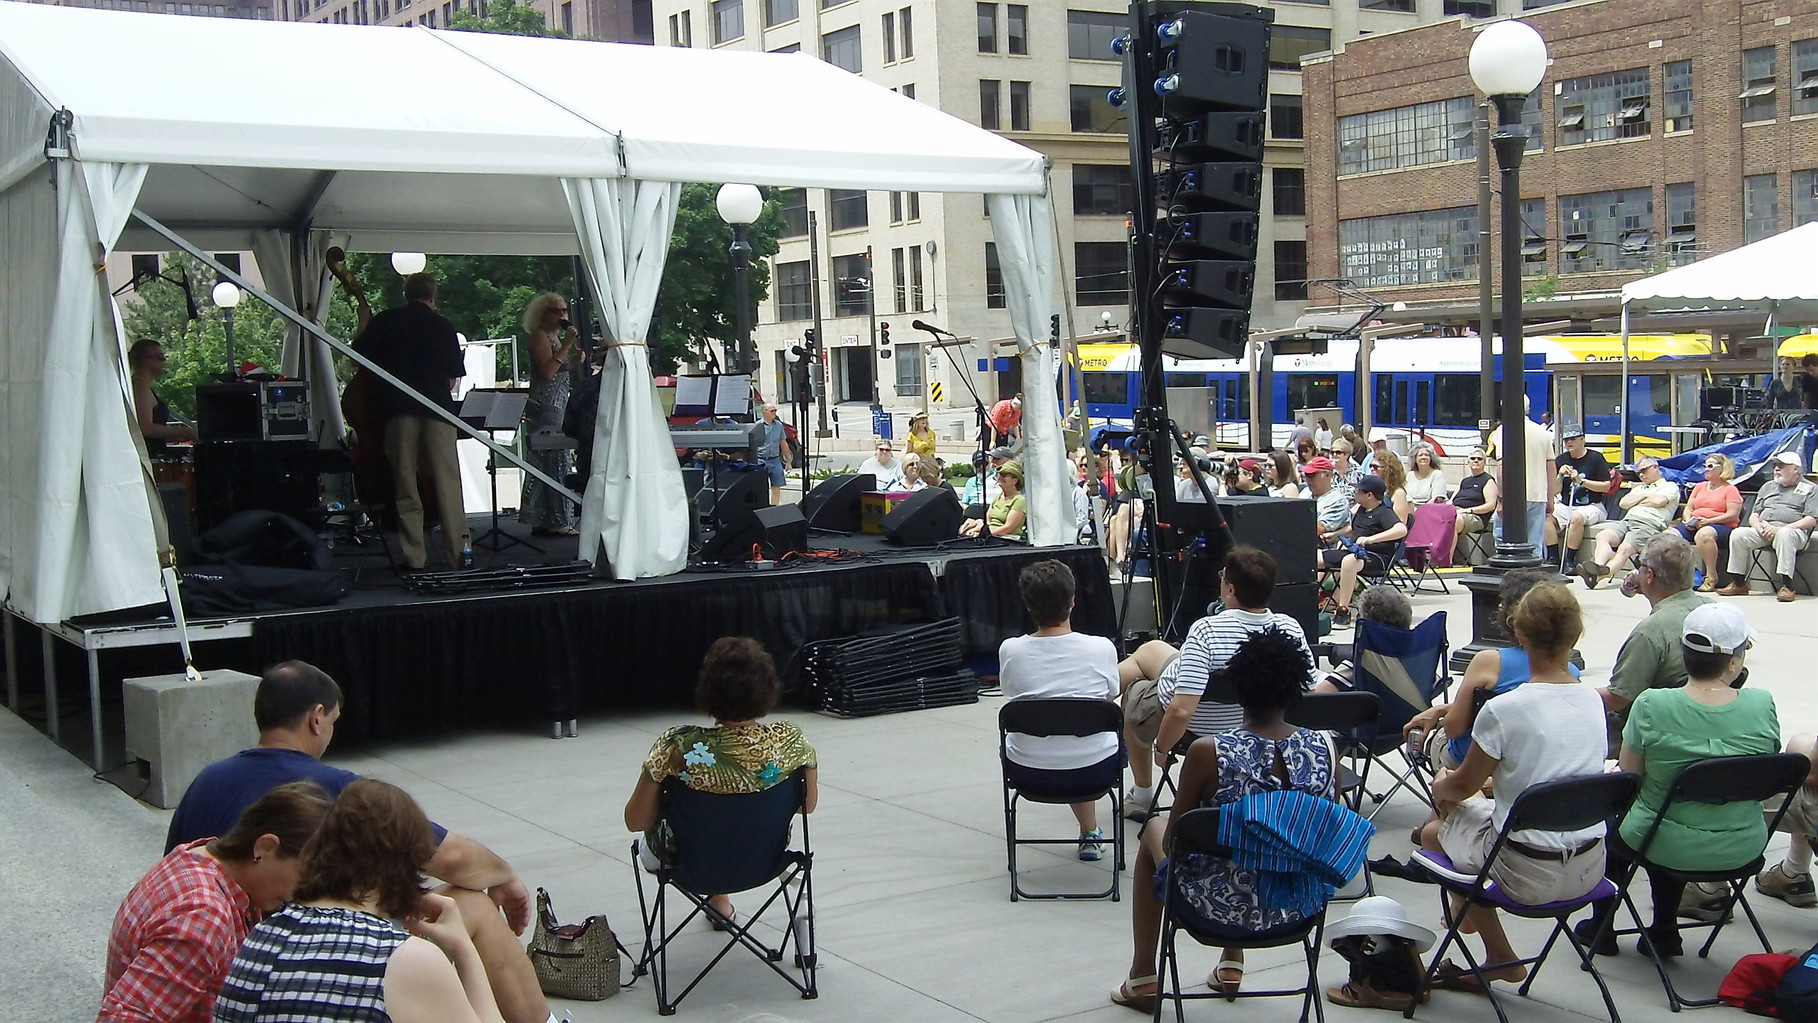 Jazz Festival, Twin Cities, Union Depot